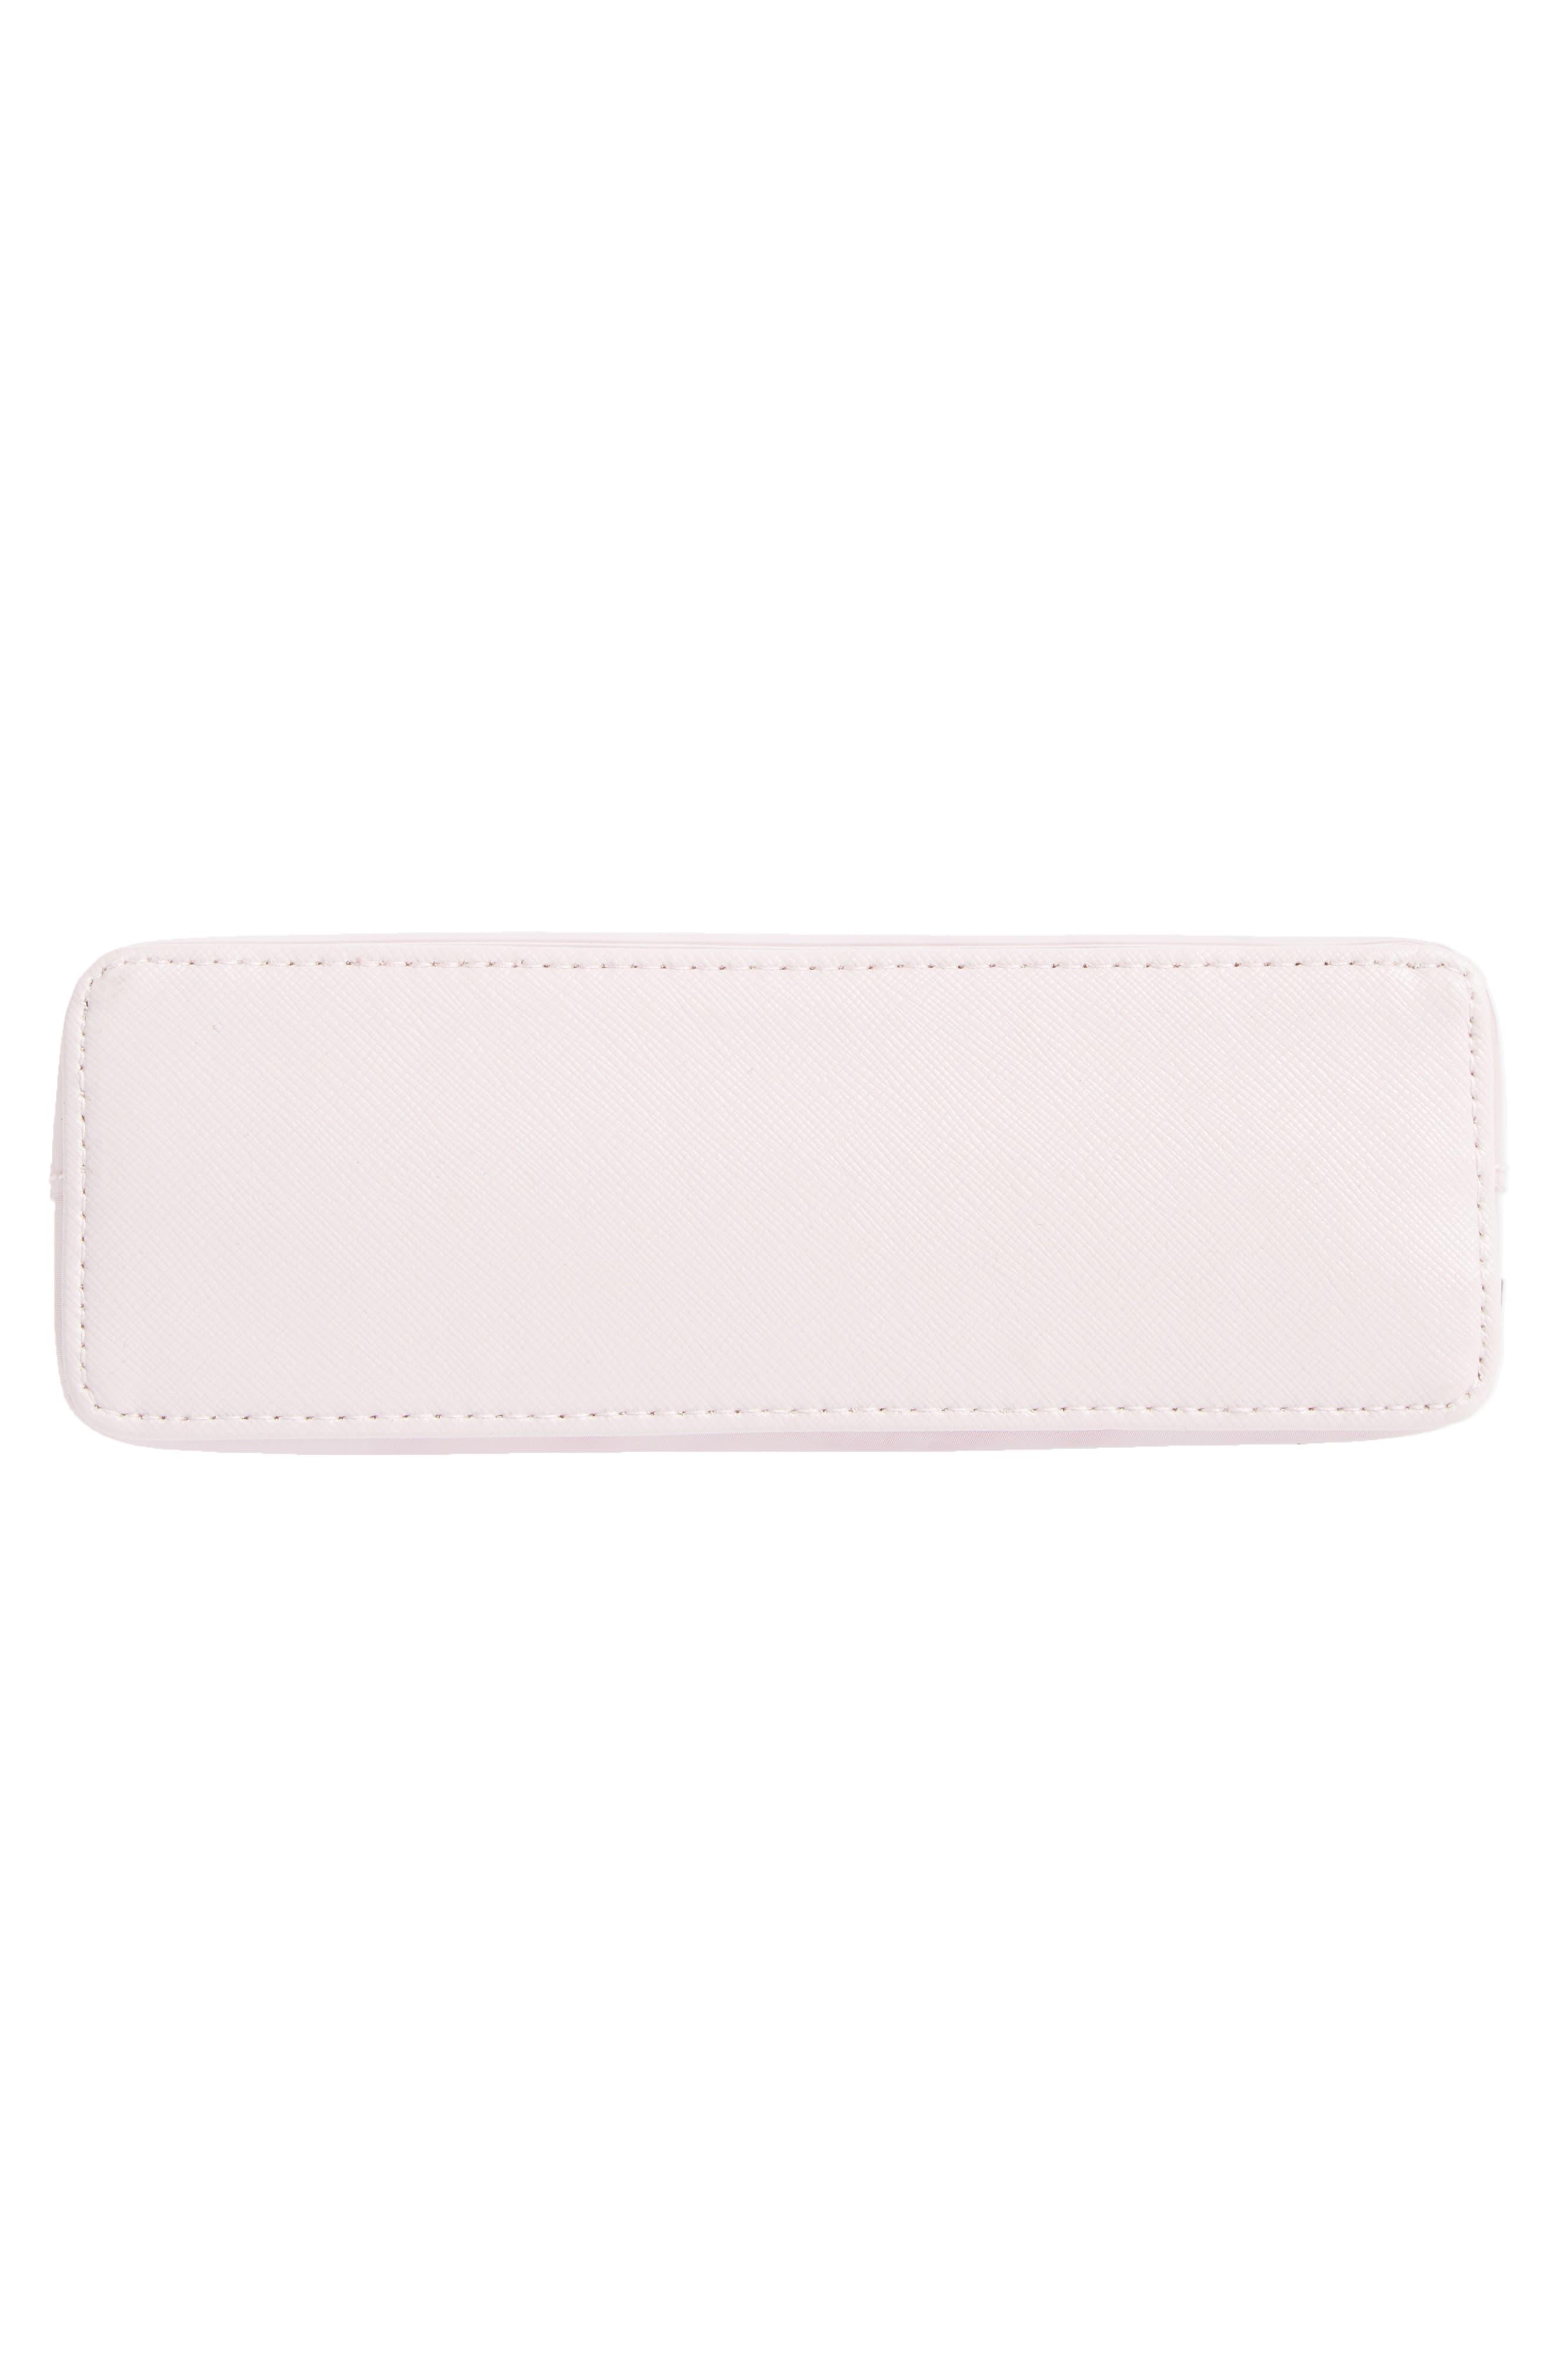 Zandra - Rose Quartz Cosmetics Bag,                             Alternate thumbnail 5, color,                             672